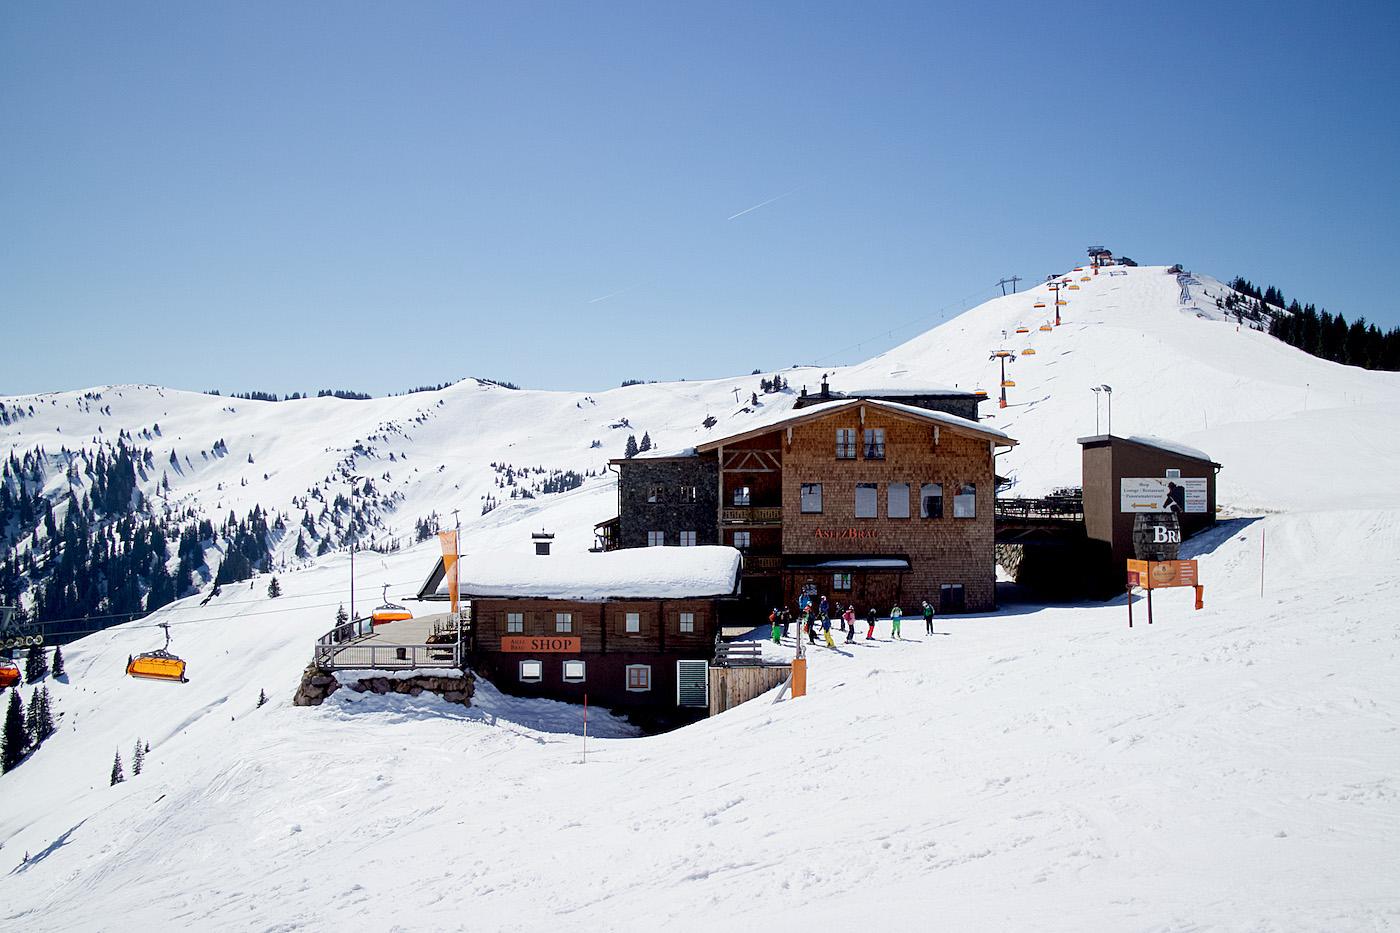 #homeoflässig |The last ski weekend in Saalbach Hinterglemm